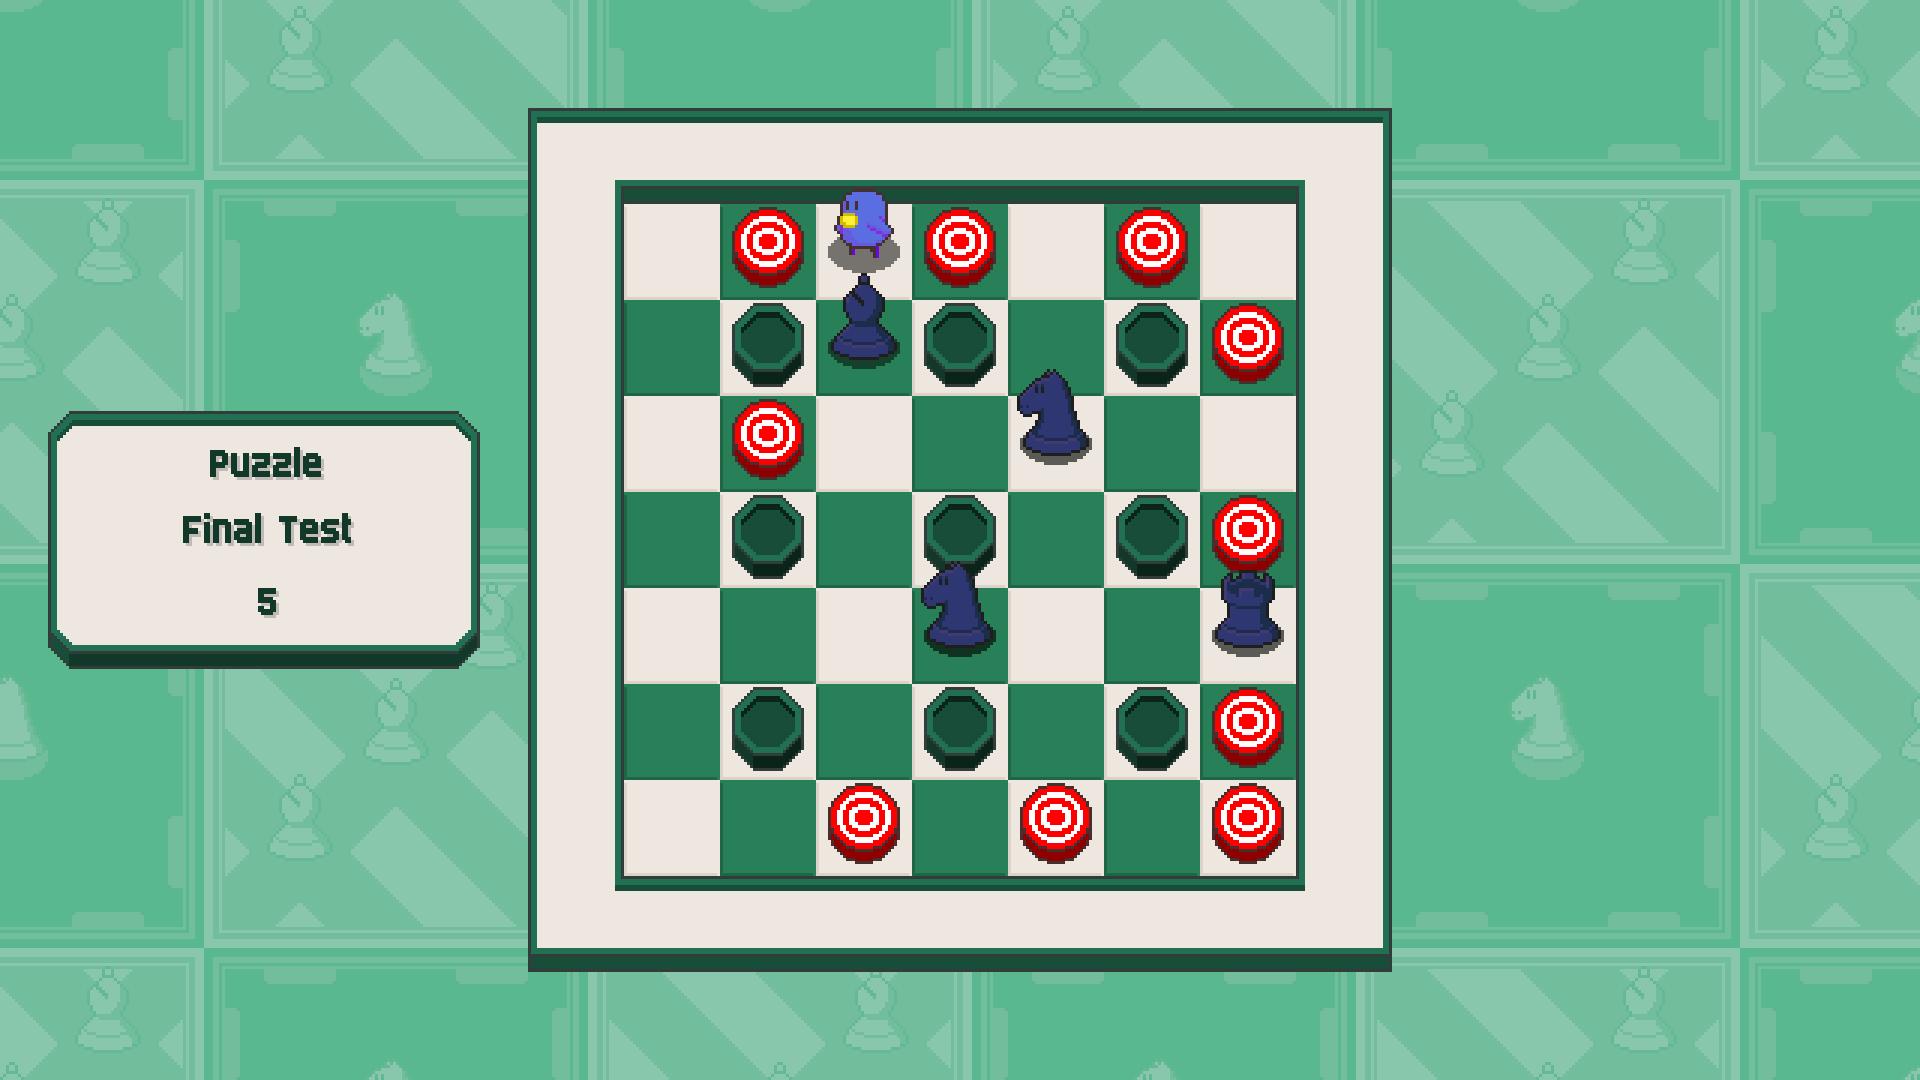 Chessplosion - Puzzle Solution Guide + Achievements Walkthrough - Grandblaster: Final Test - 27699E7